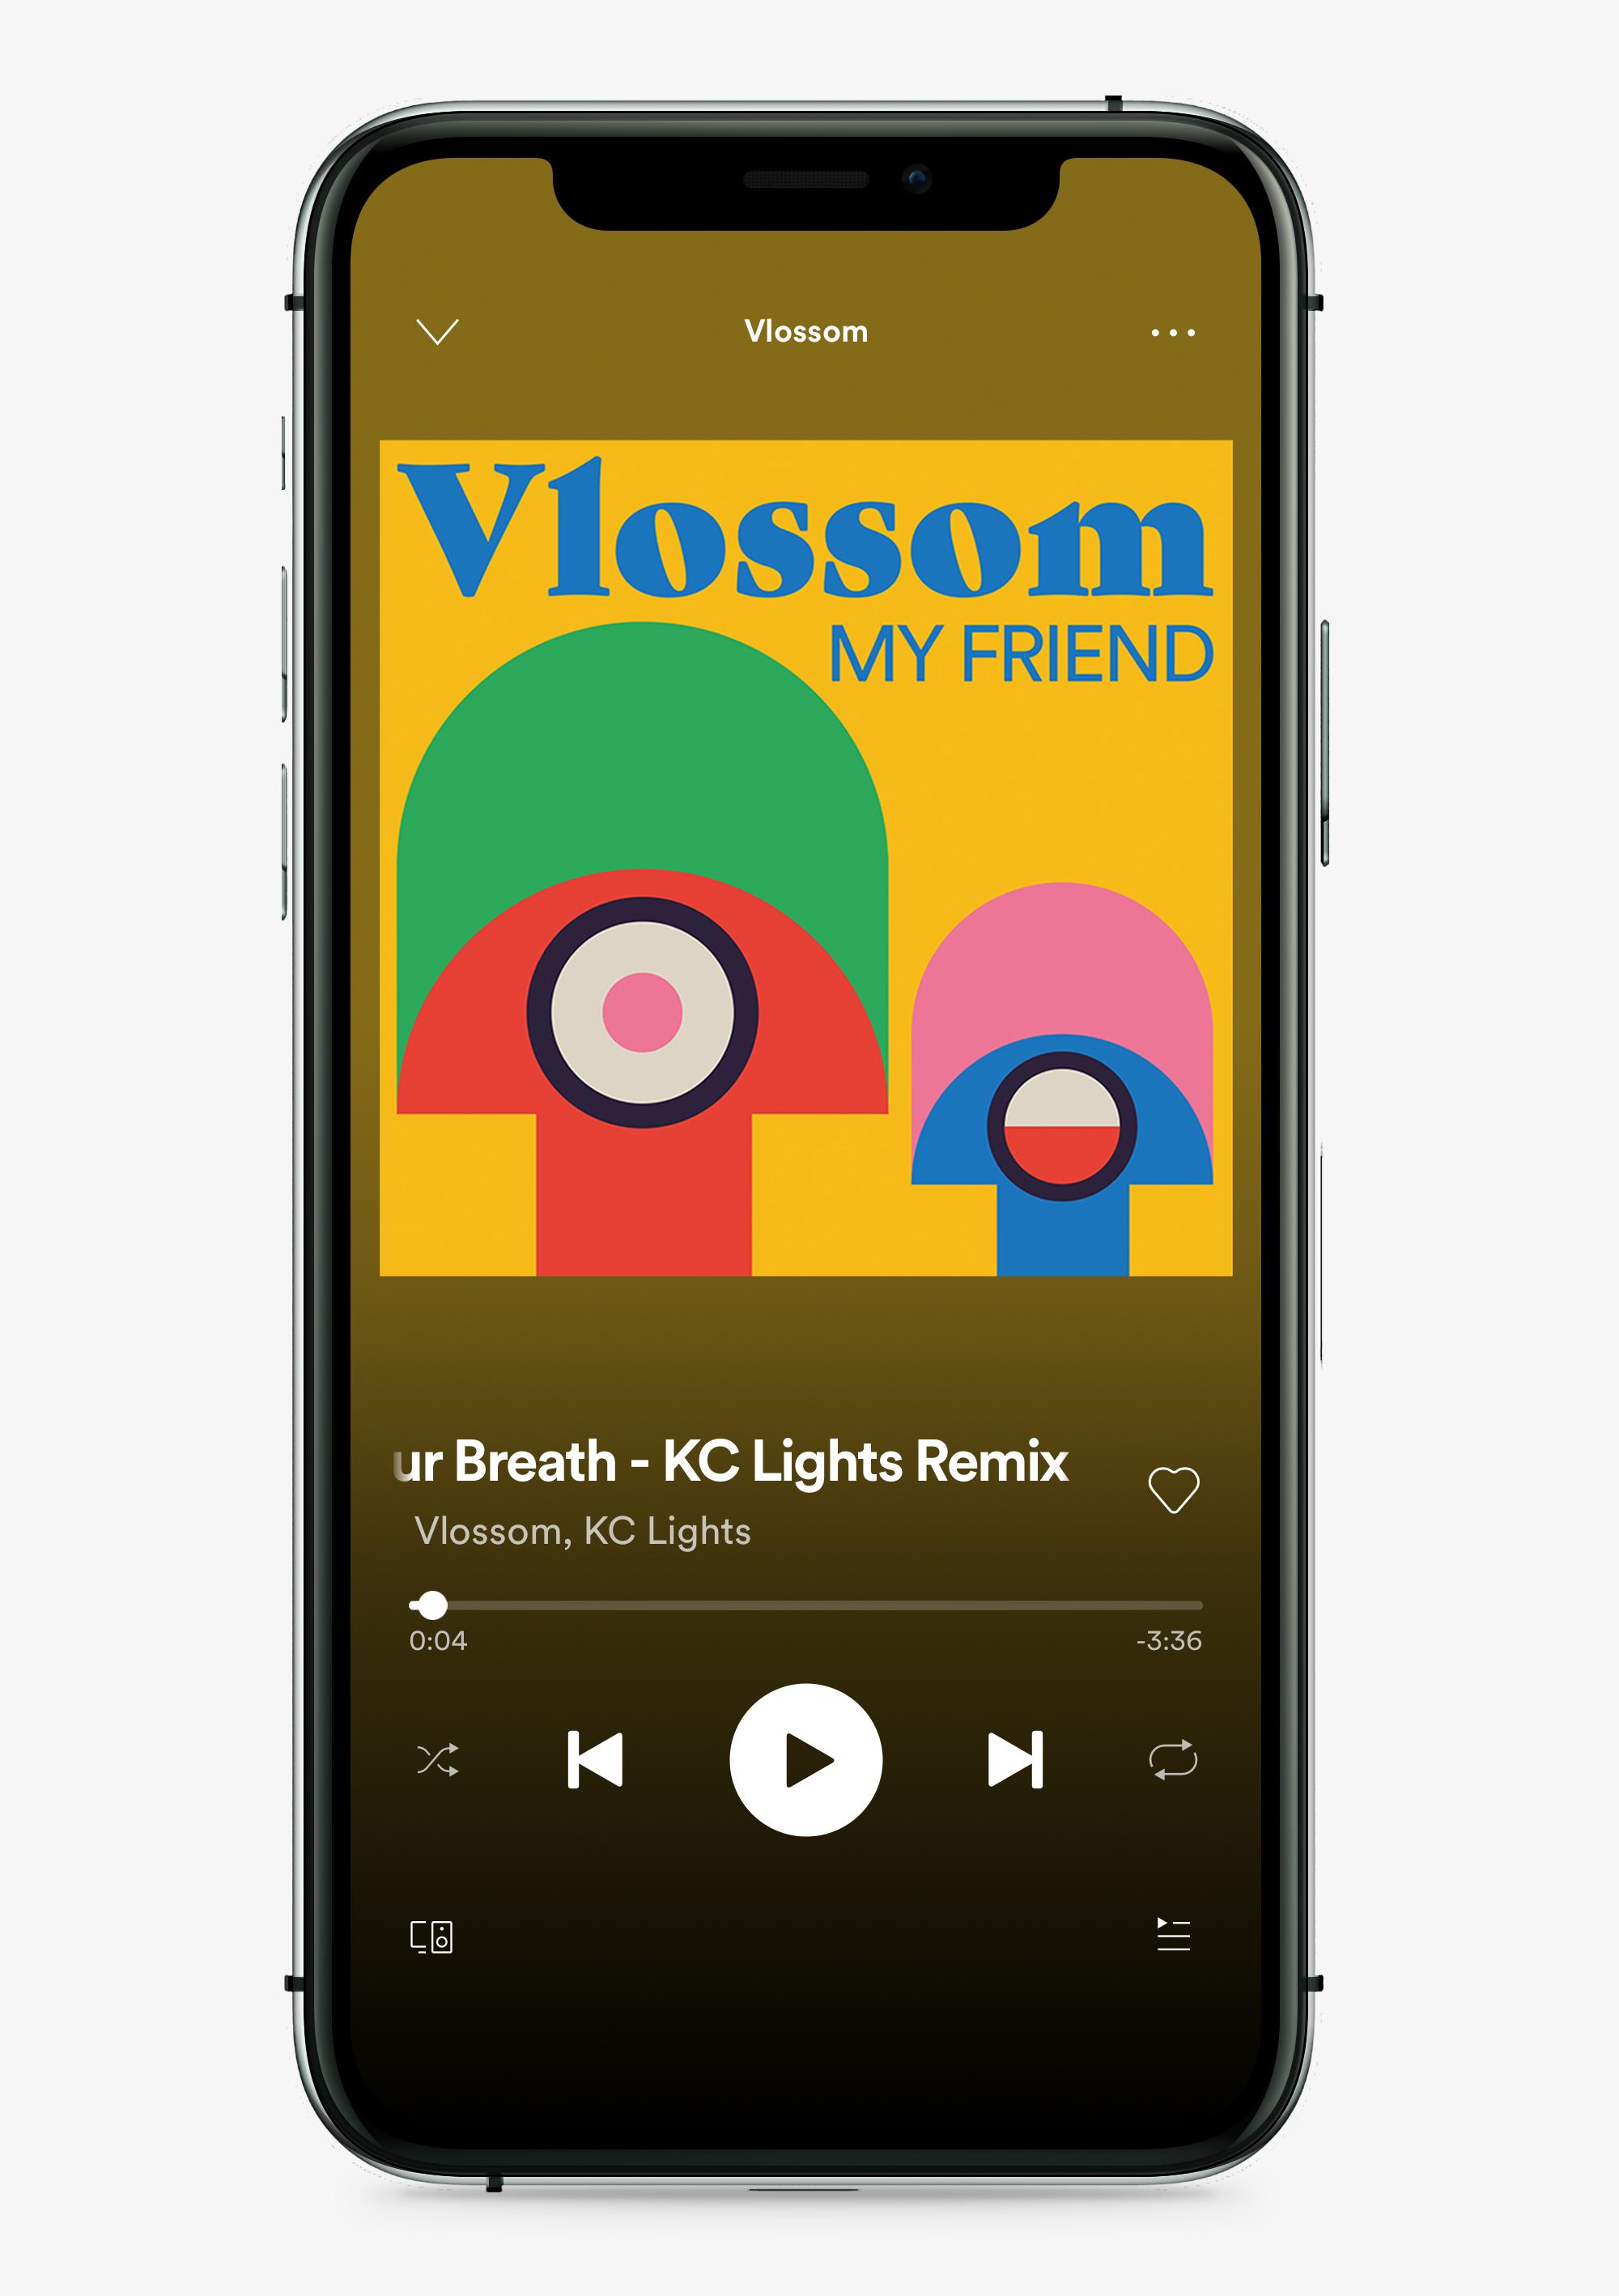 album_vlossom_spotify_laura_niubo